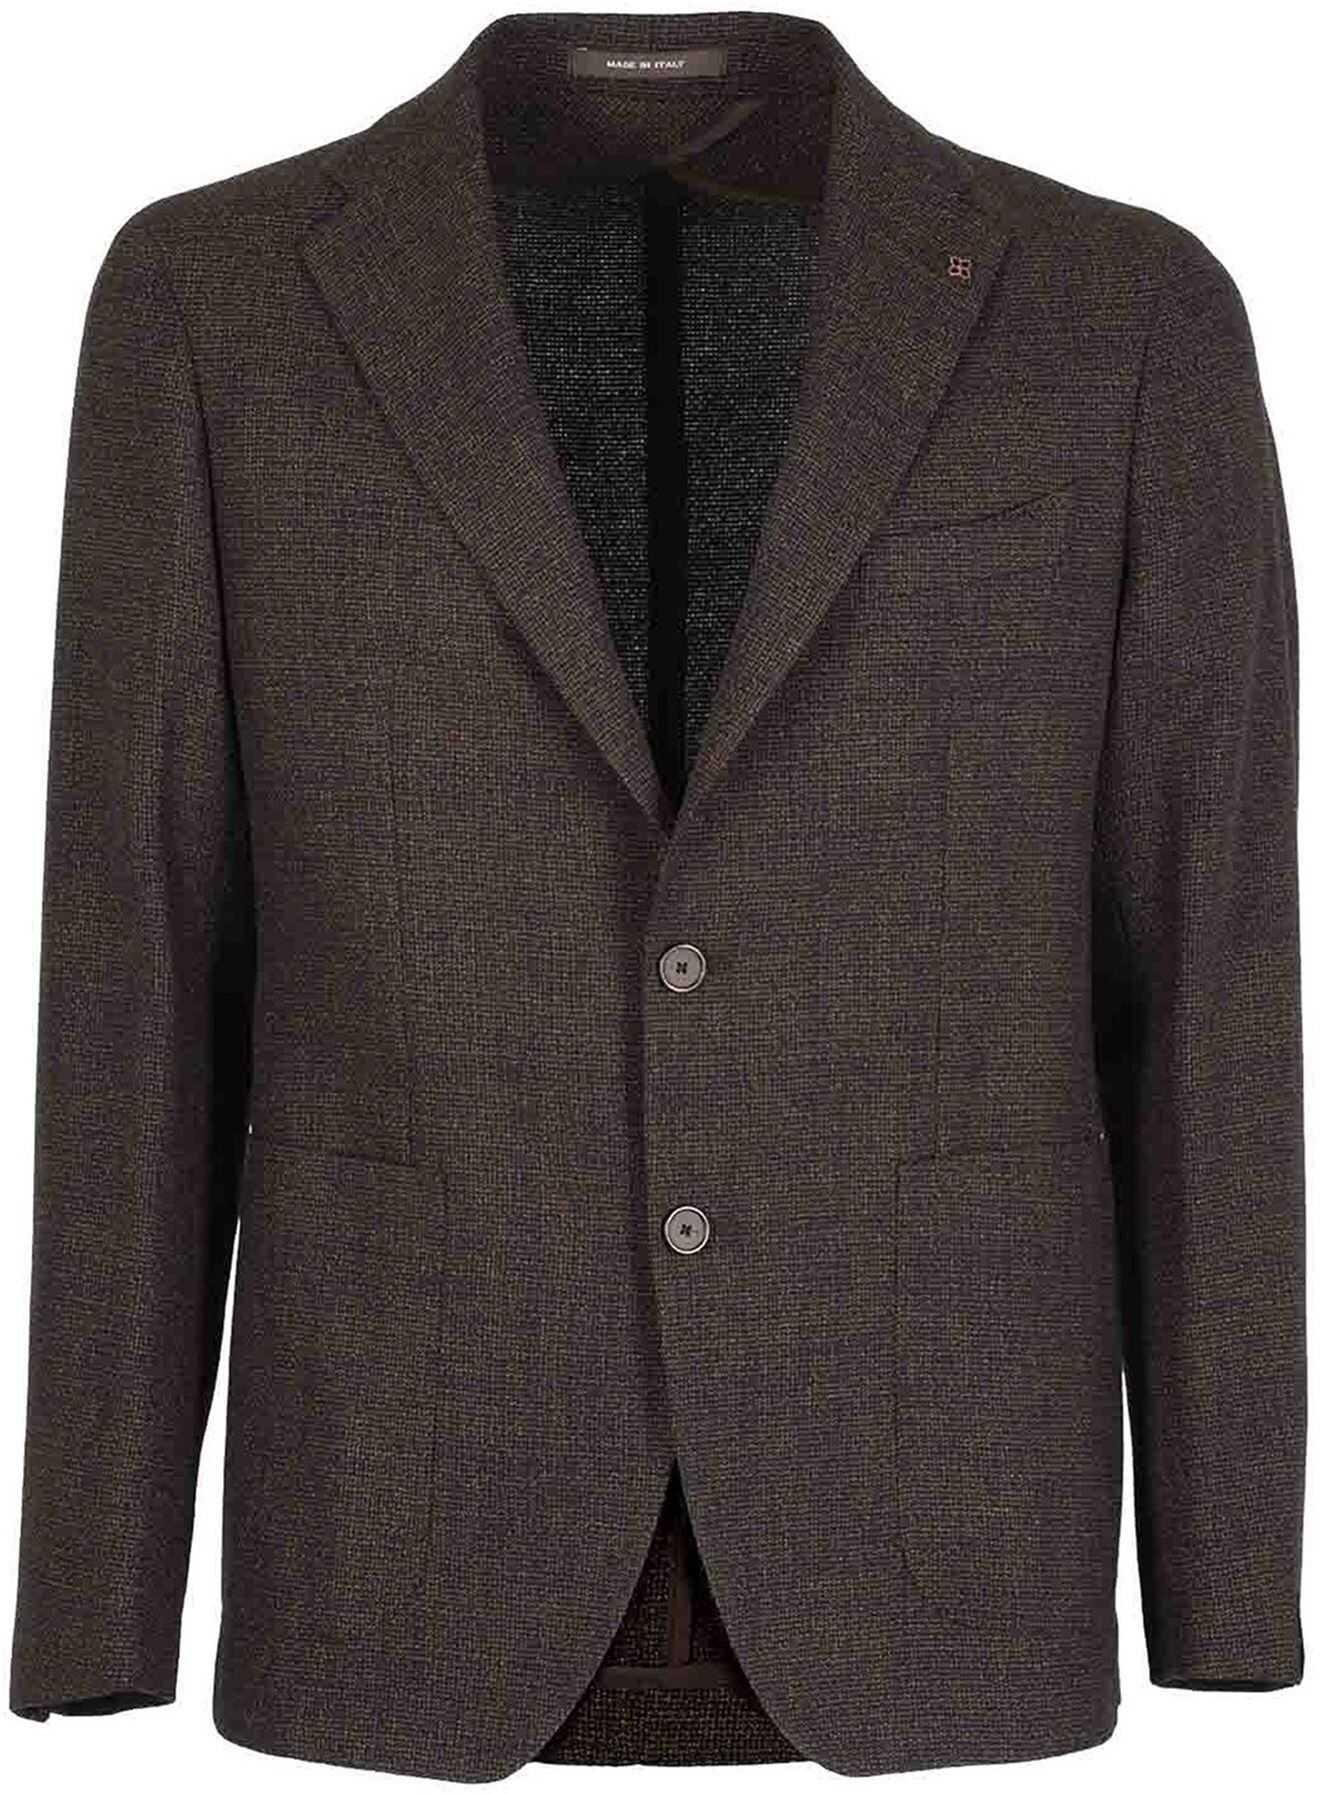 Tagliatore Montecarlo Wool Bland Blazer In Brown Brown imagine